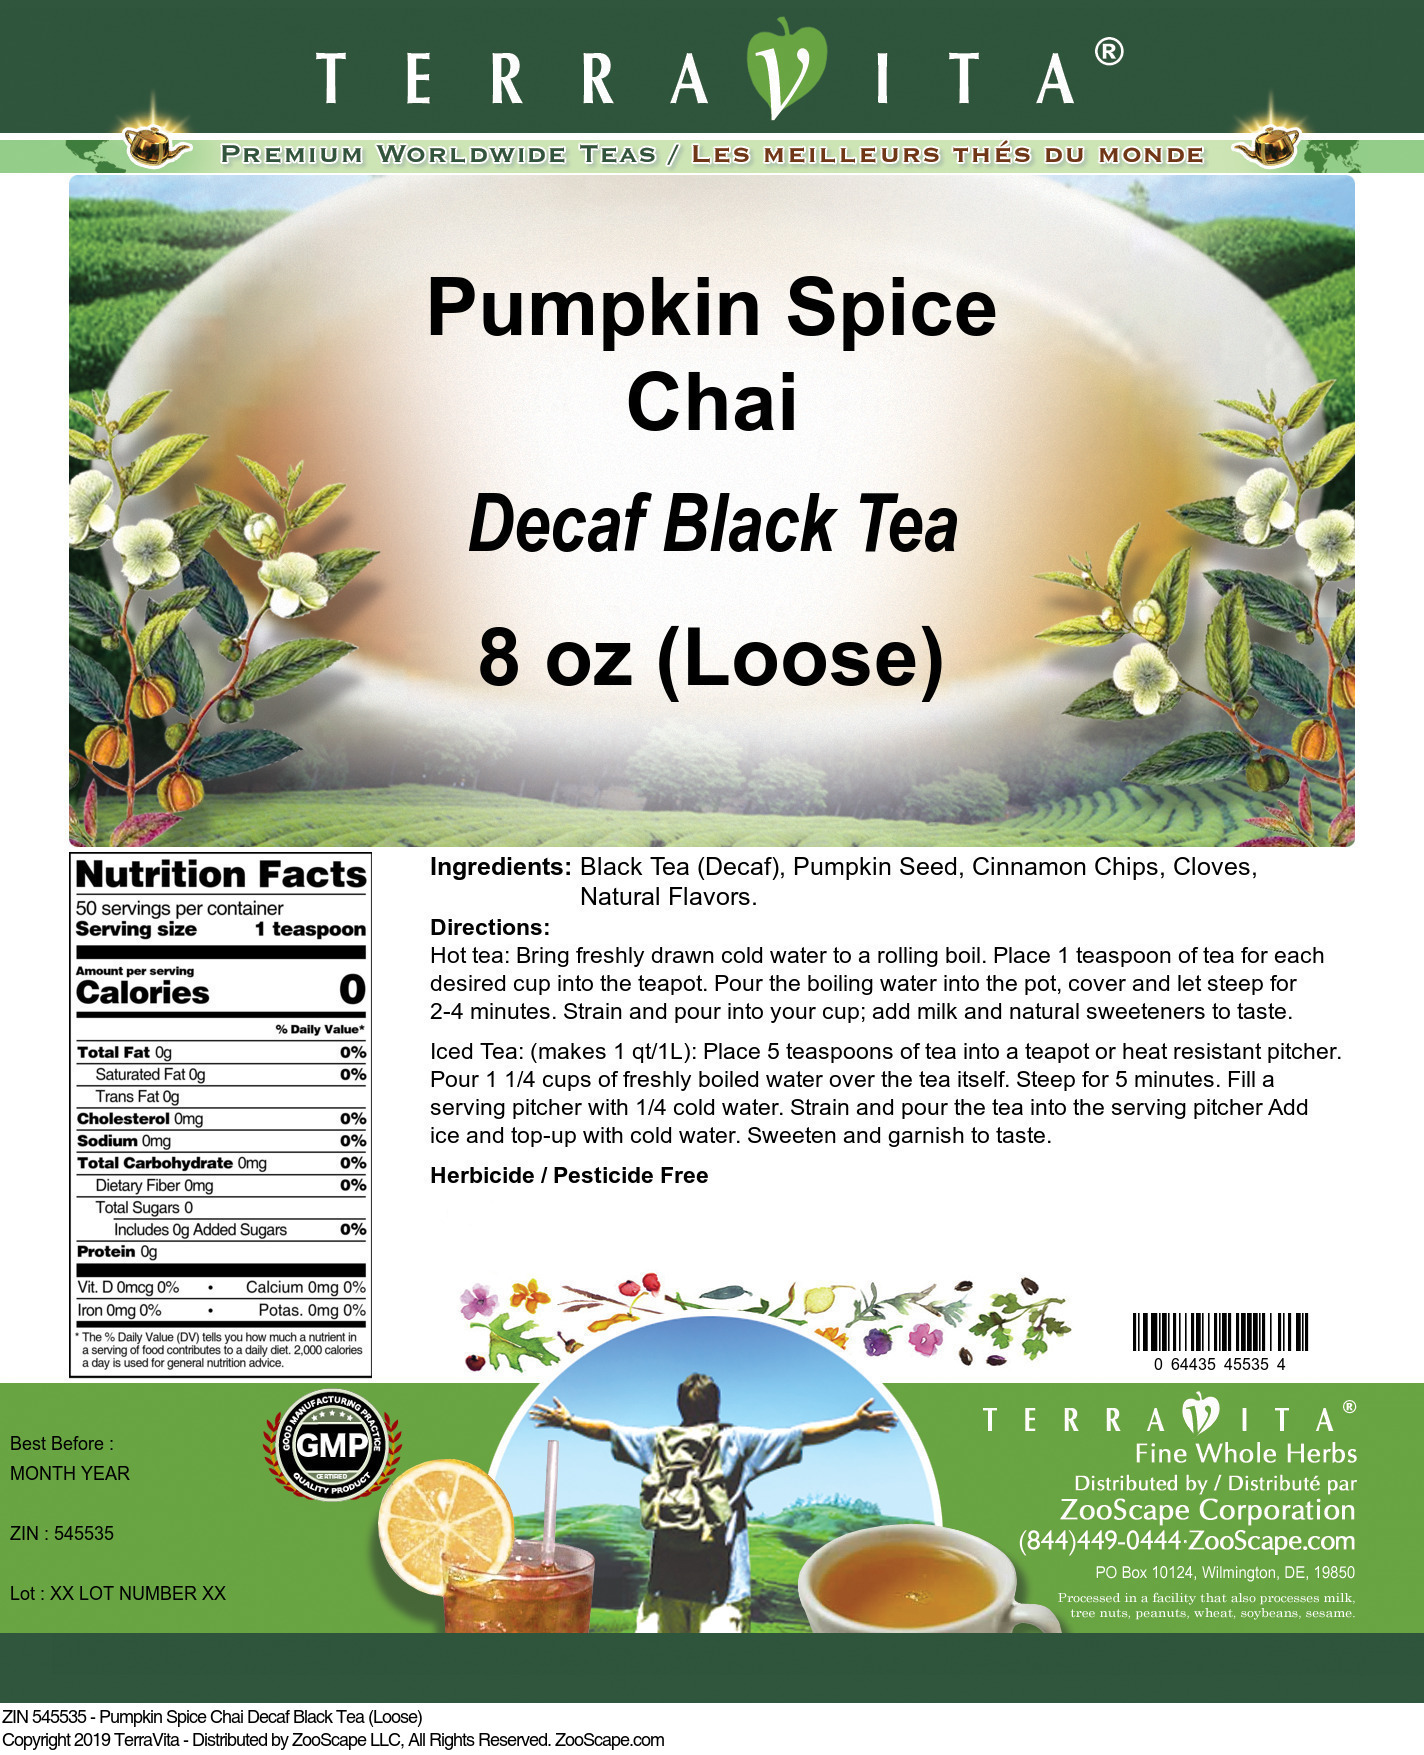 Pumpkin Spice Chai Decaf Black Tea (Loose)